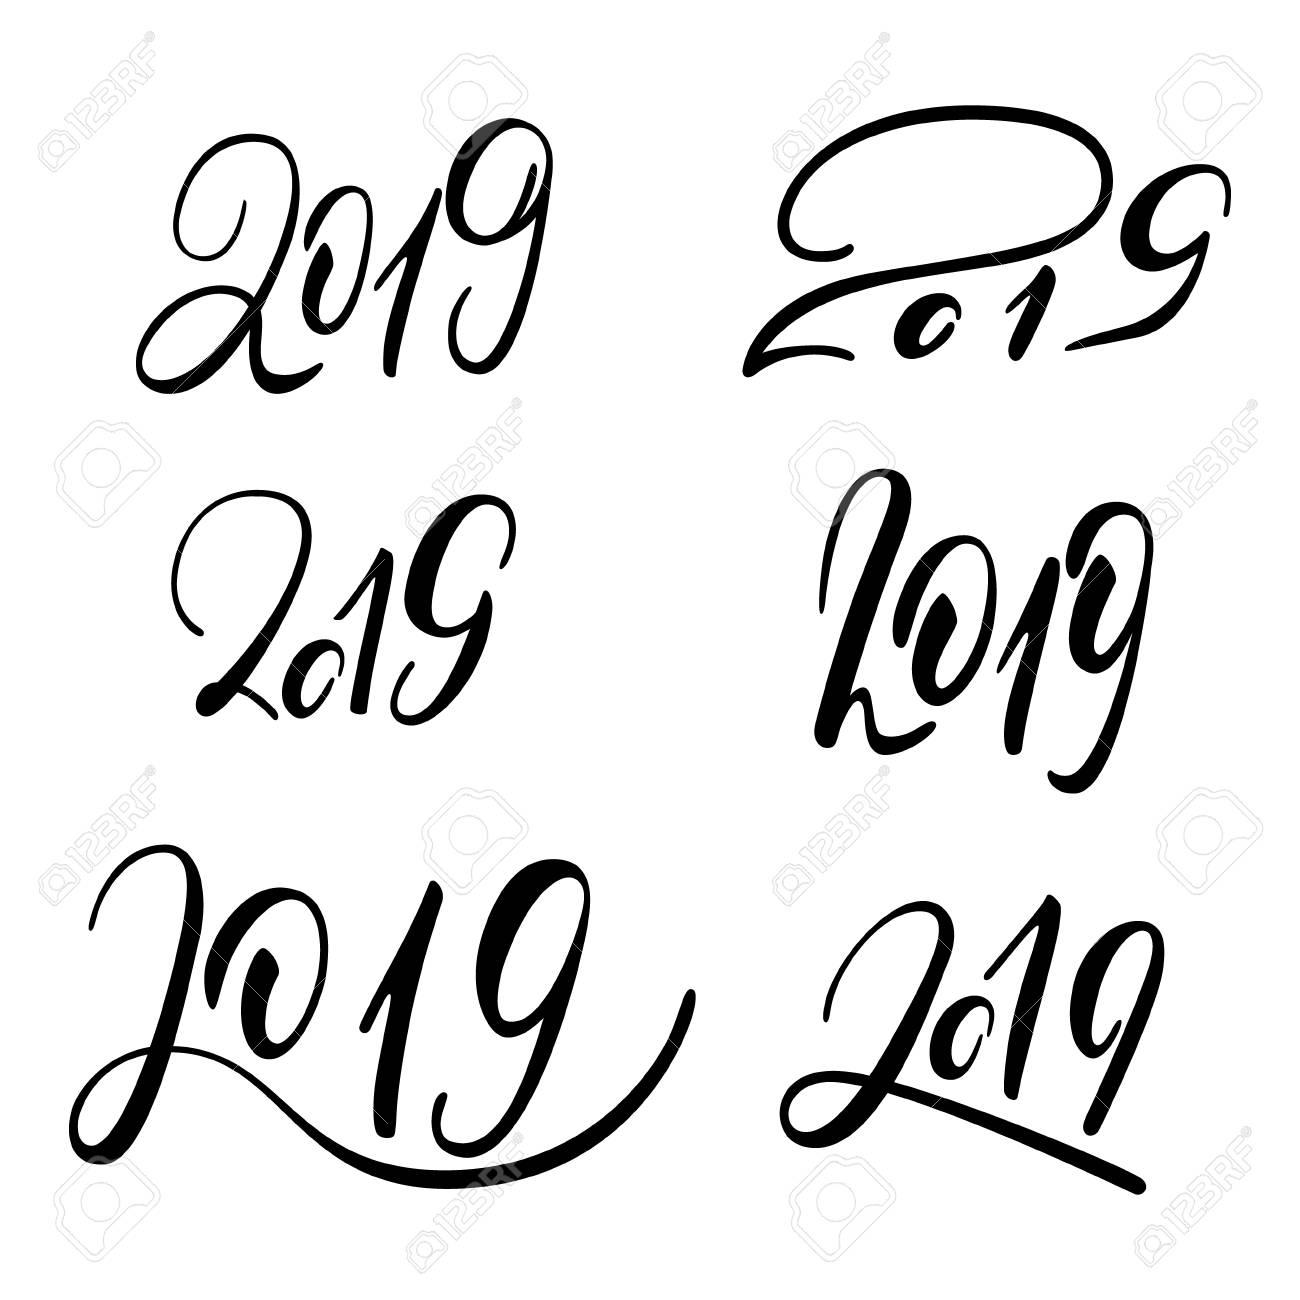 2019  New Year  Handwritten Lettering  Text  Modern Calligraphy